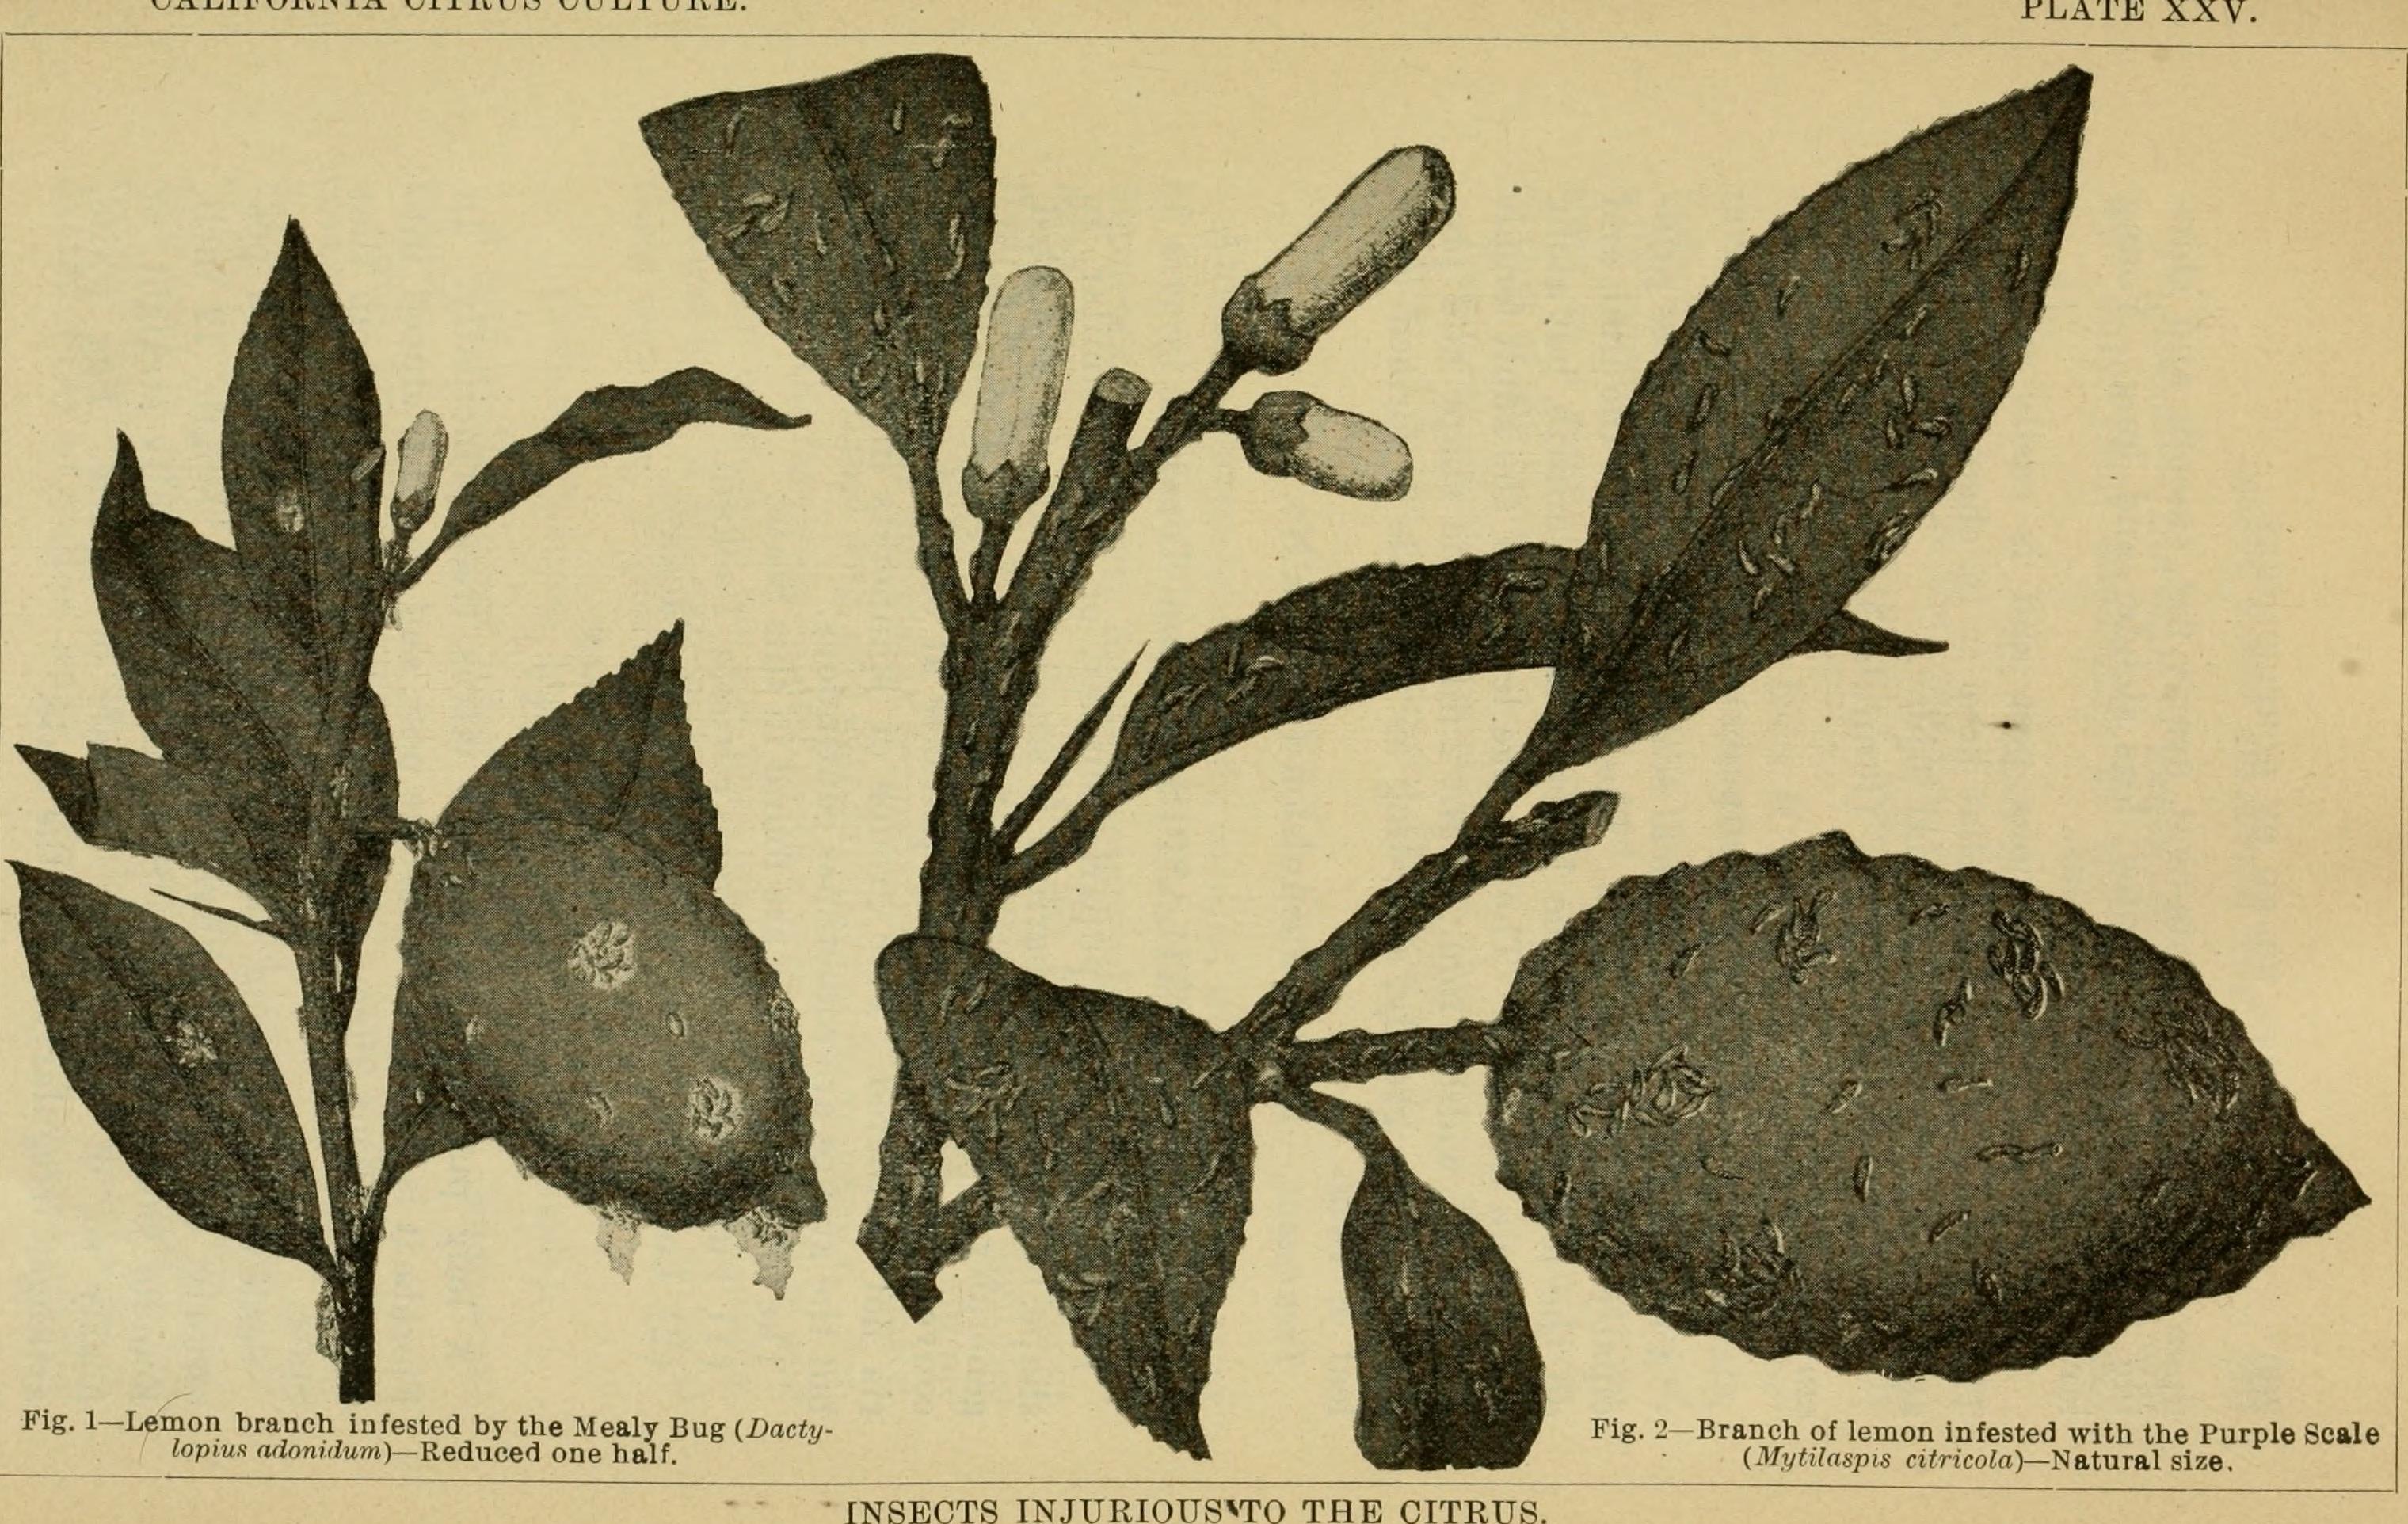 Image of citrus mussel scale